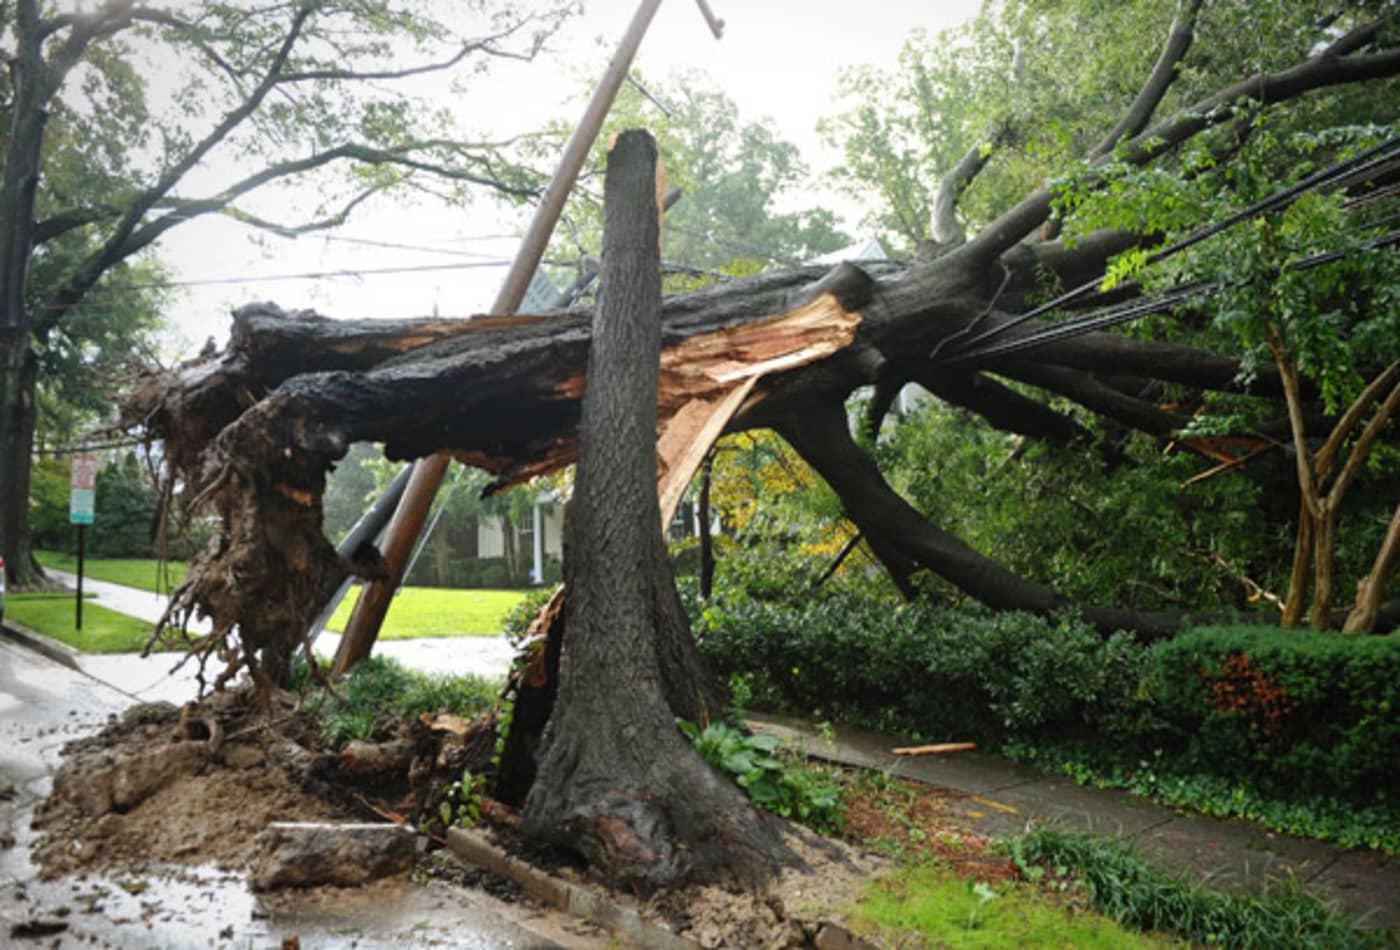 Irene_AUG28_DC_tree_split.jpg